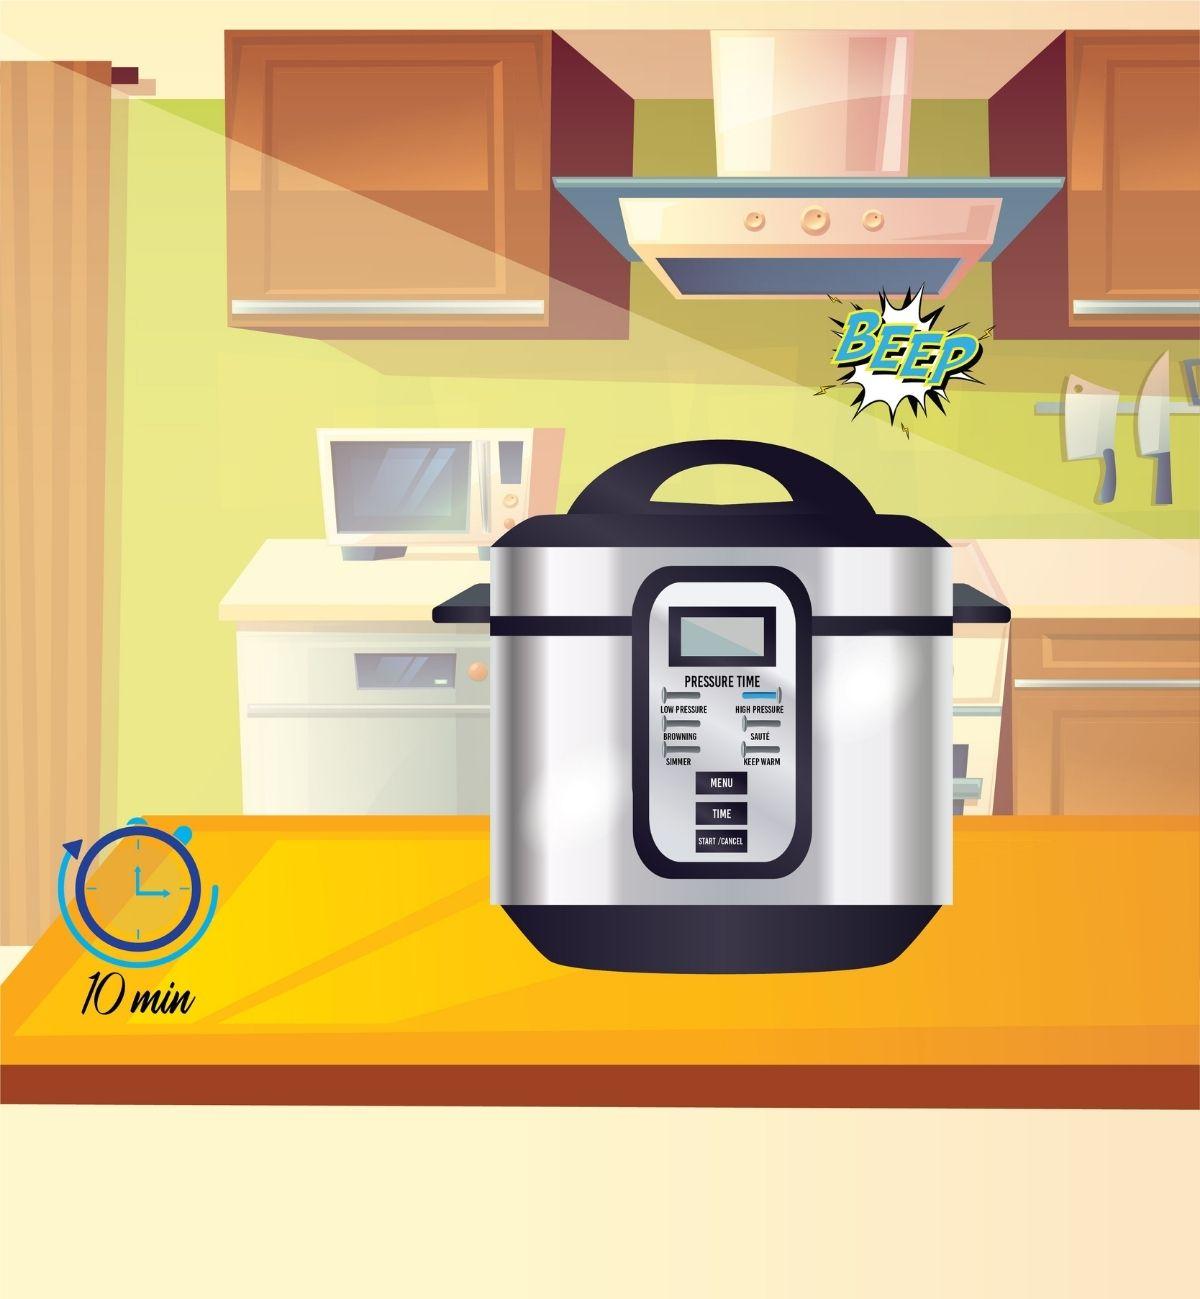 timer beeps, turn off the pressure cooker